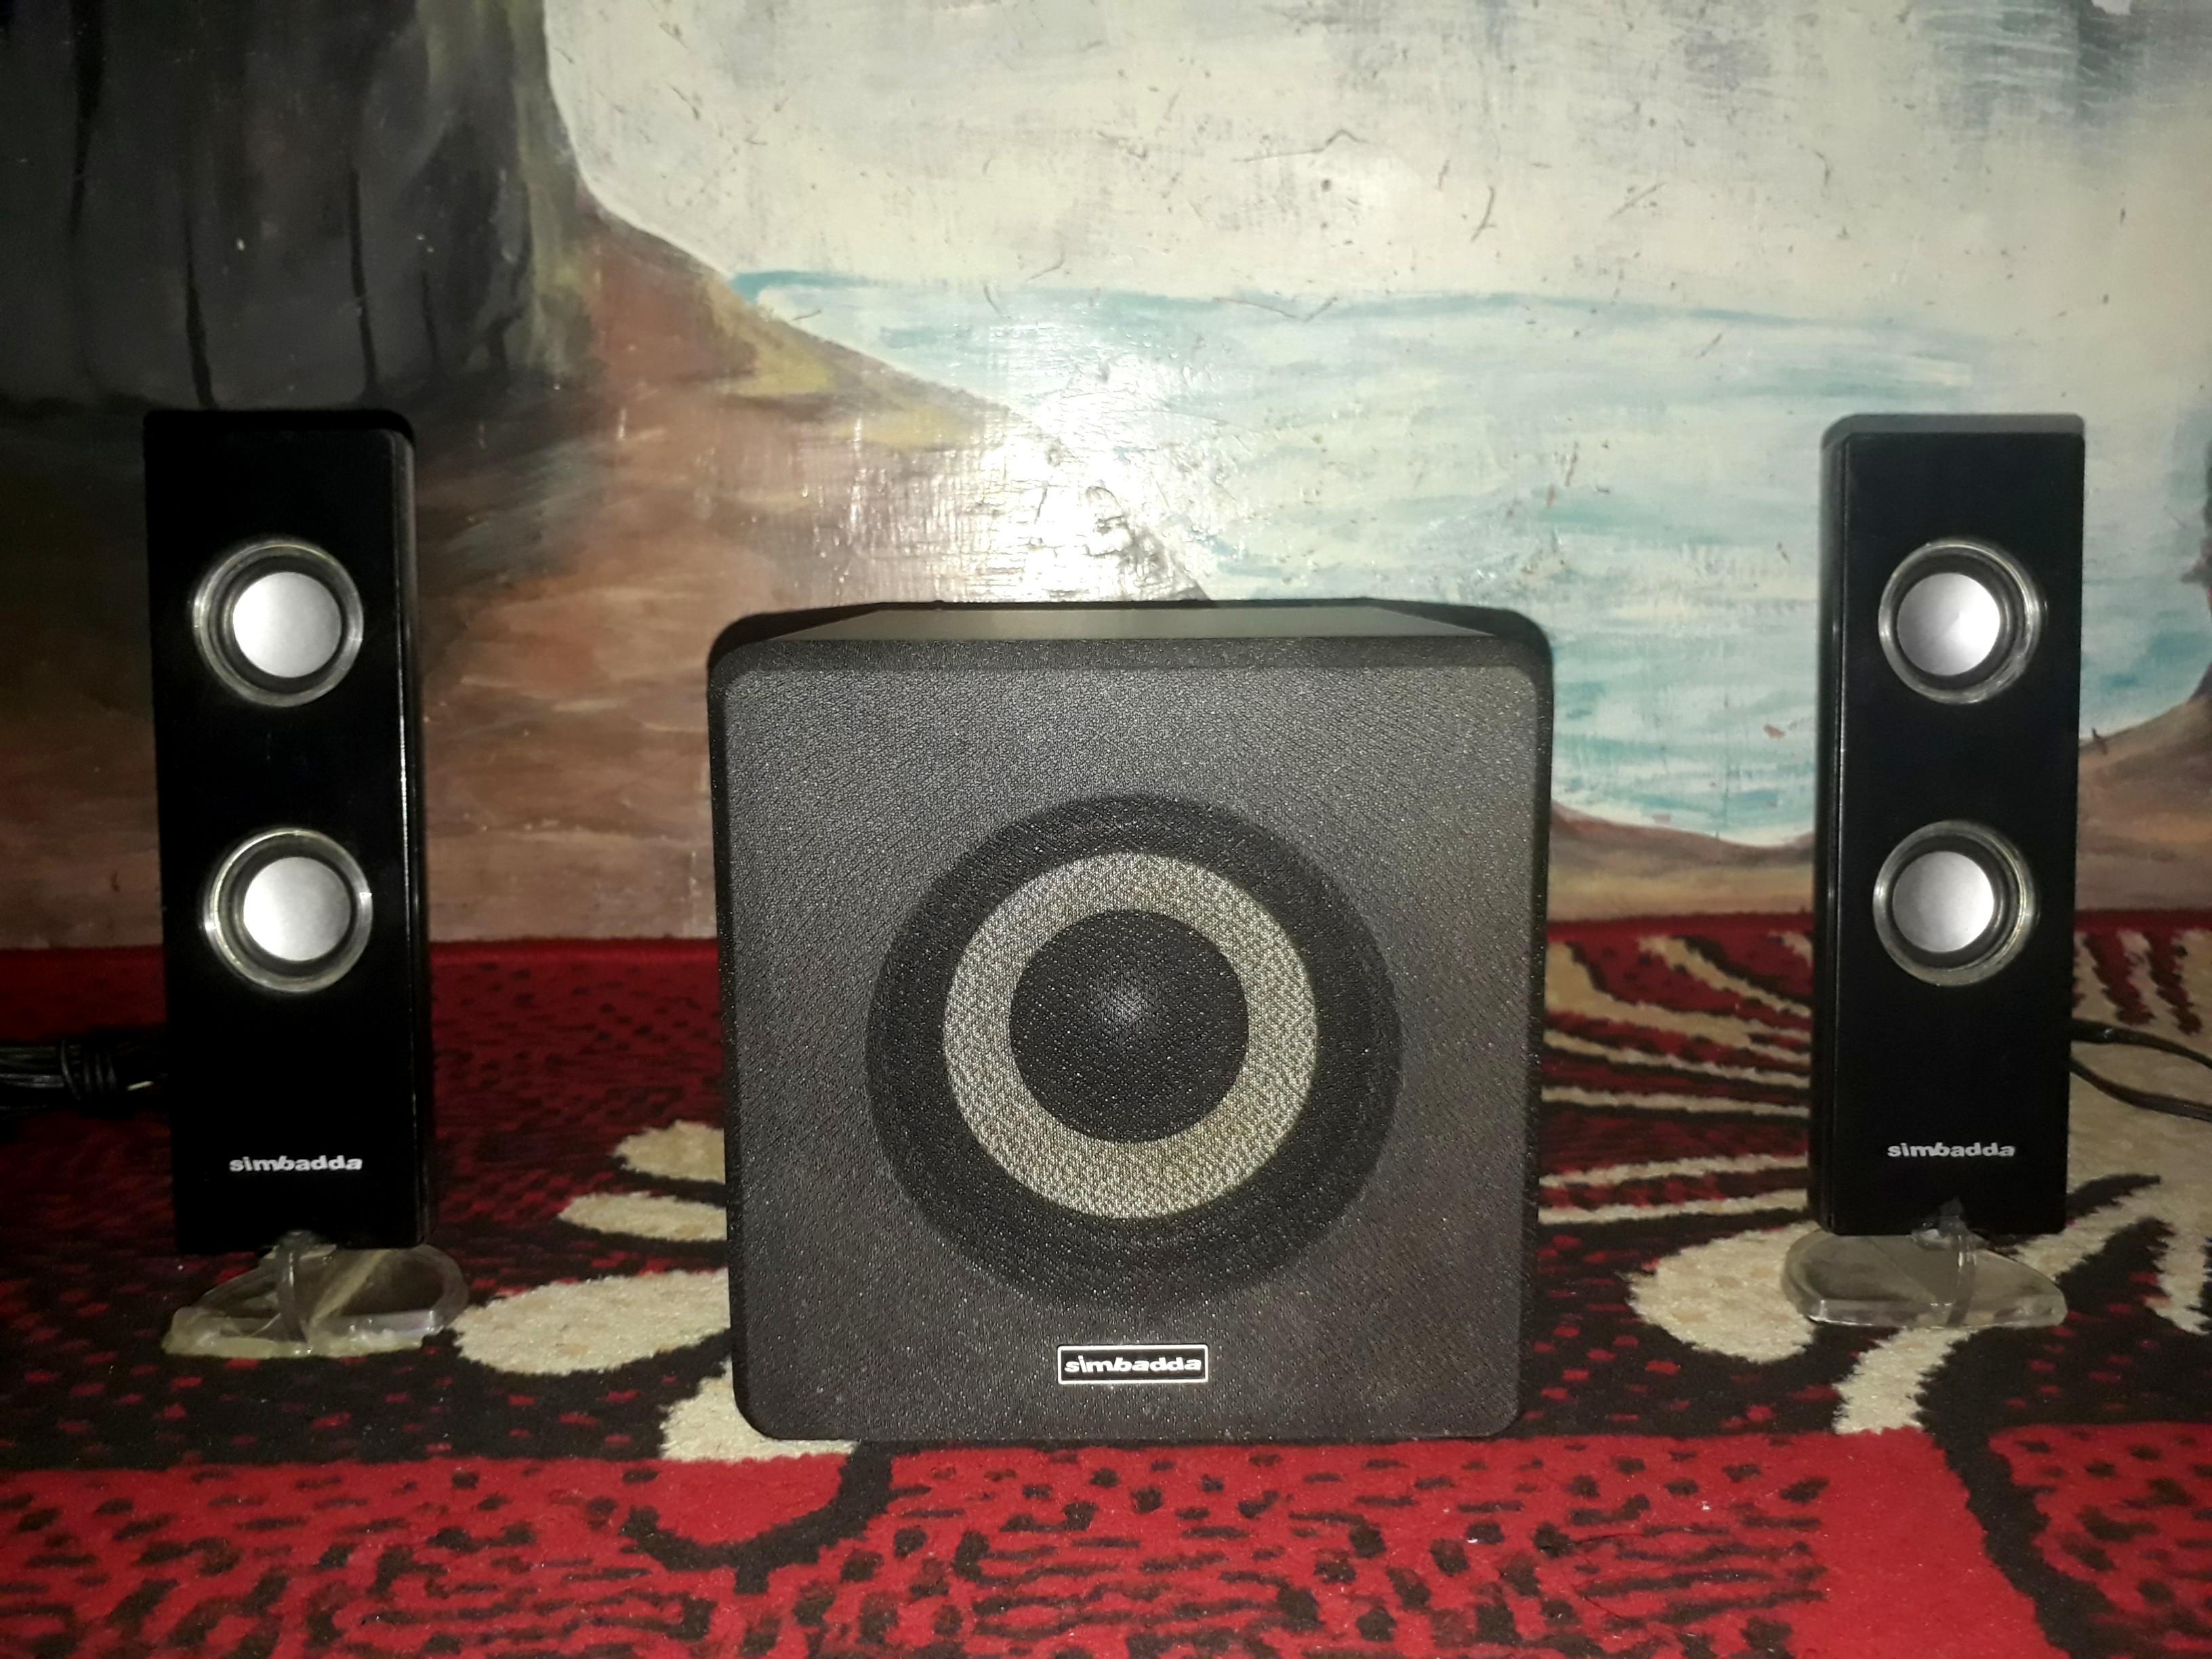 Speaker Subwoofer Simbadda CST 6400N 2.1 Suara Lembut Bassnya Nendang #Cicaheum